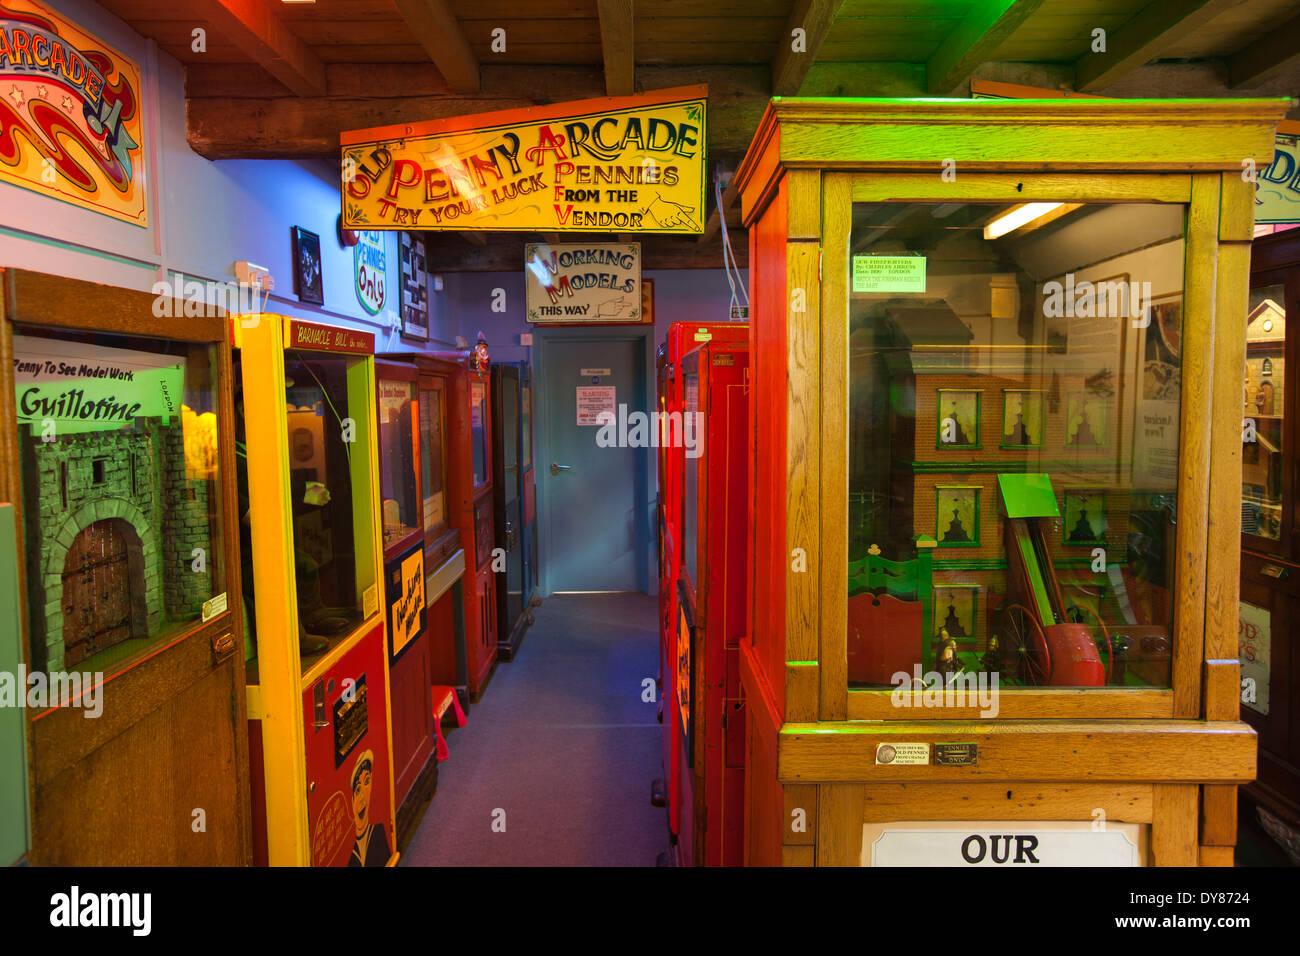 UK, England, East Sussex, Rye, Heritage Centre, vintage end of pier penny arcade games - Stock Image